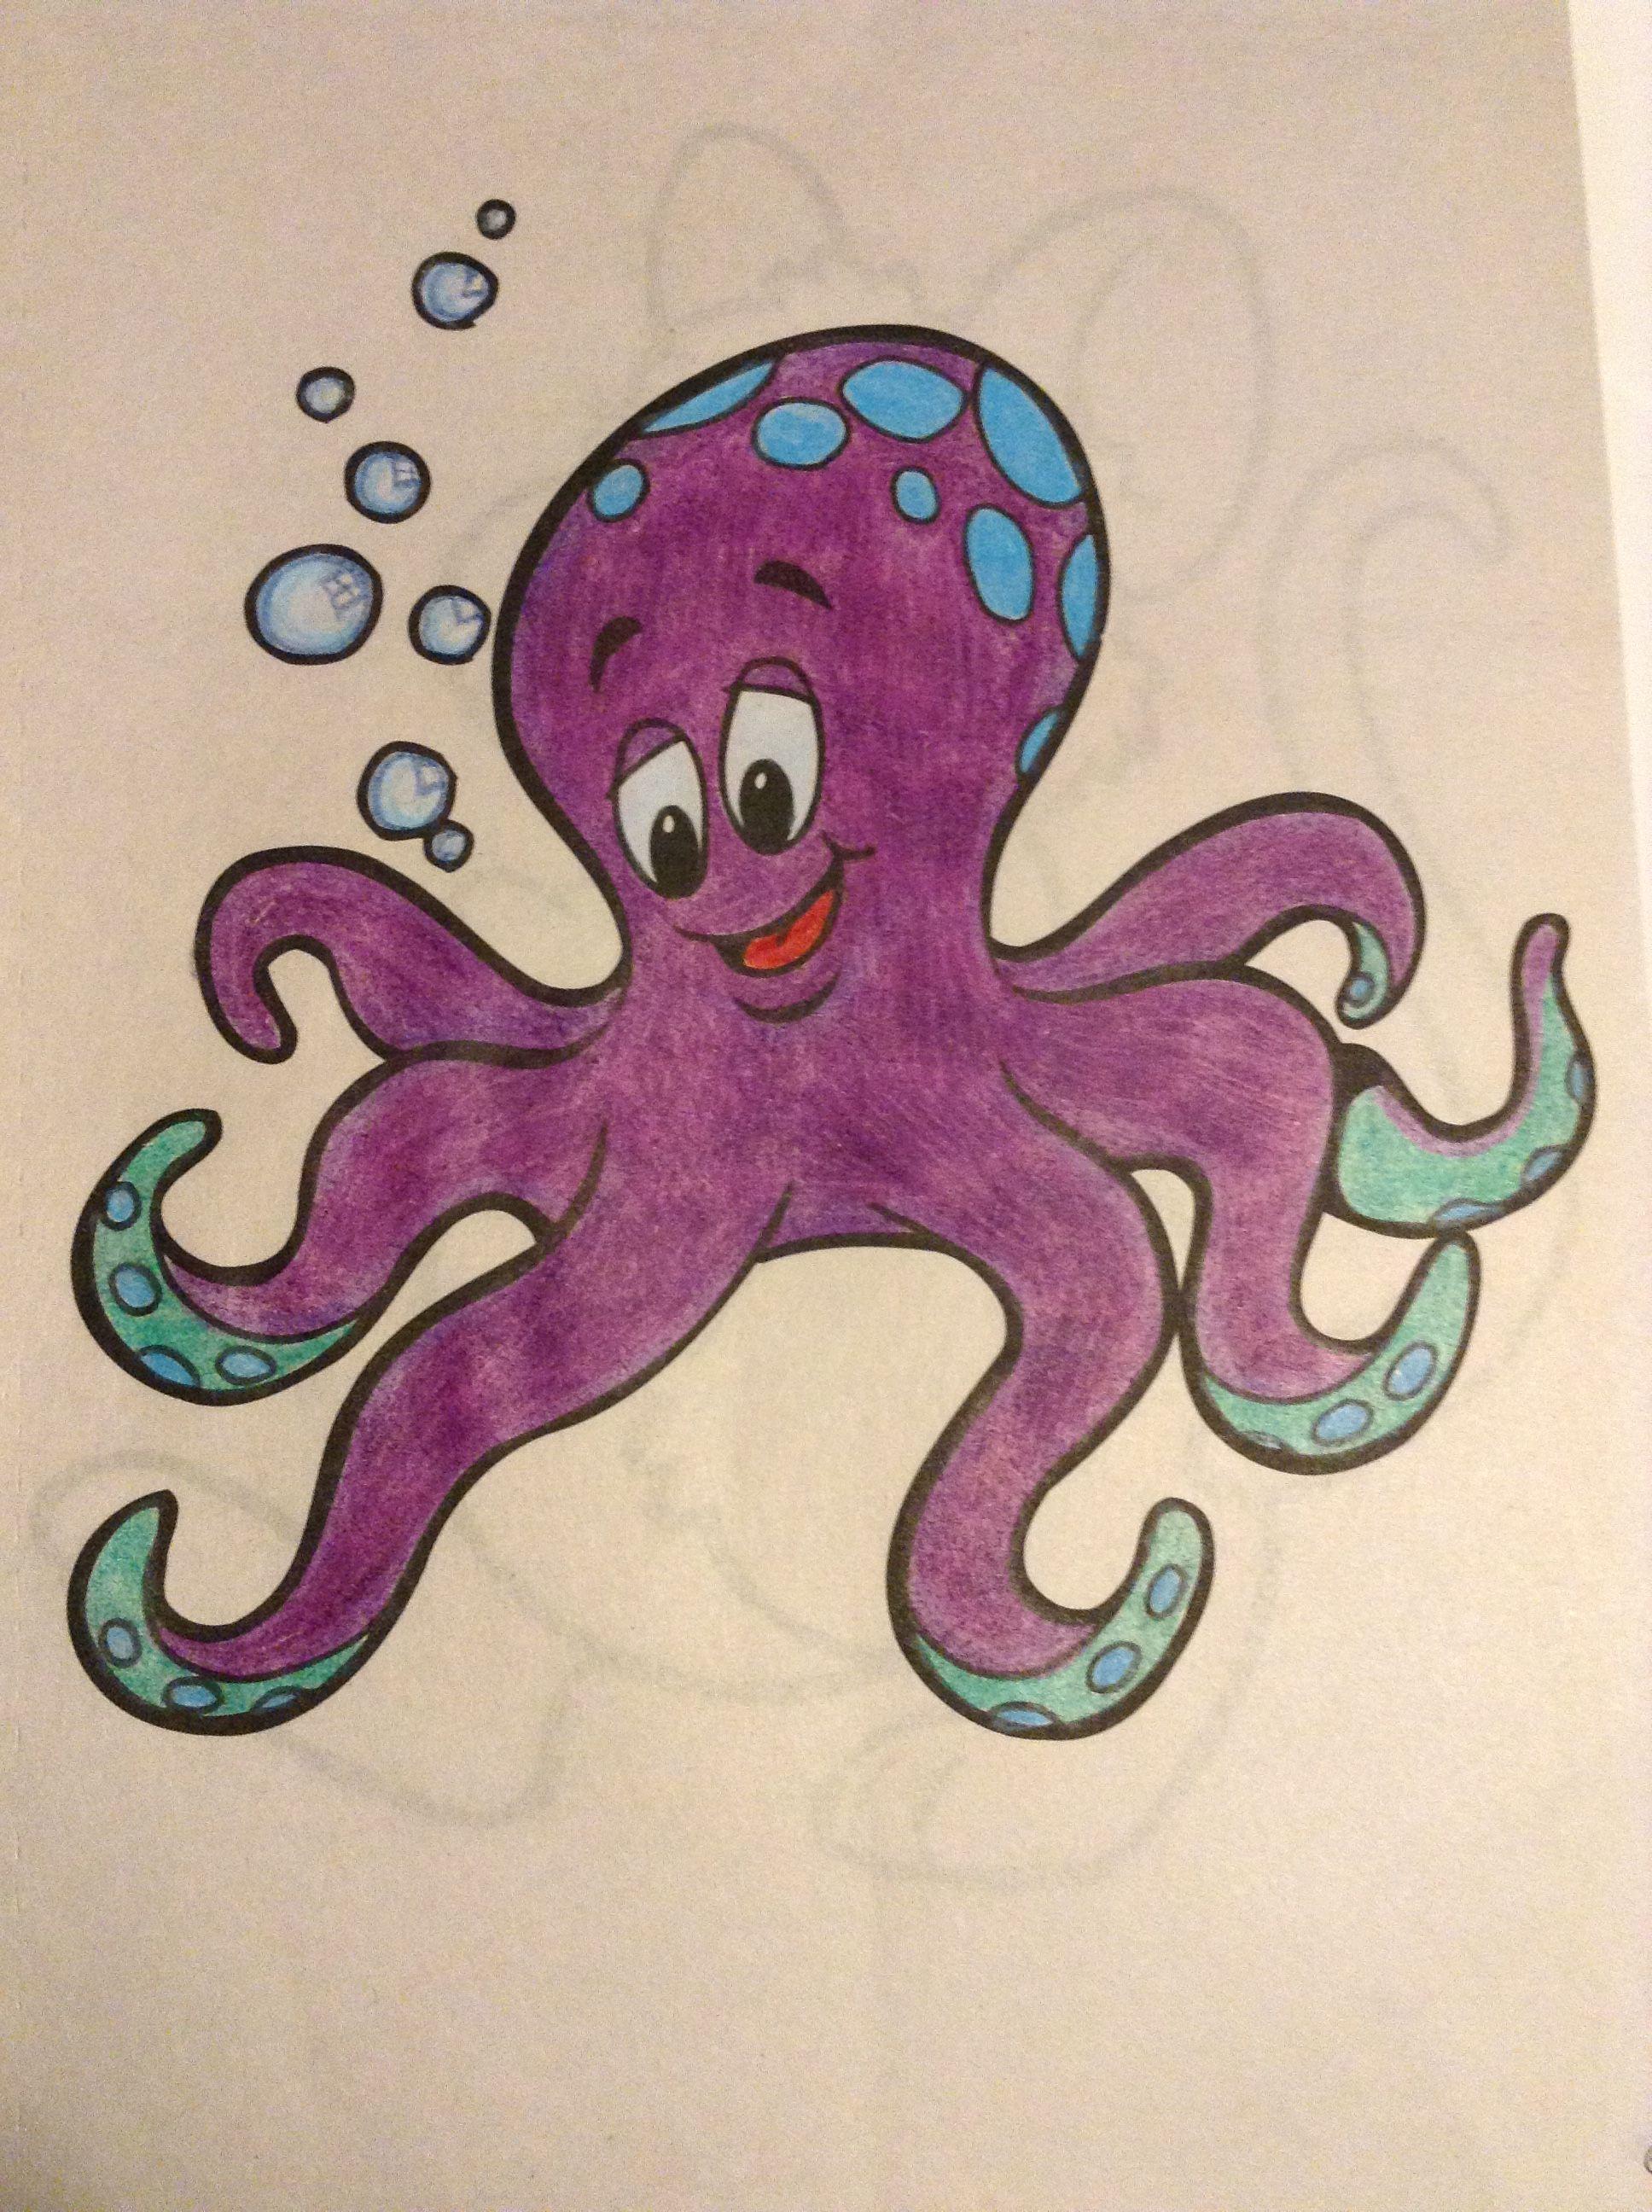 Pin By Fati Burkbart On My Coloring Drawing Tutorials For Kids Cartoon Kids Drawing Tutorial